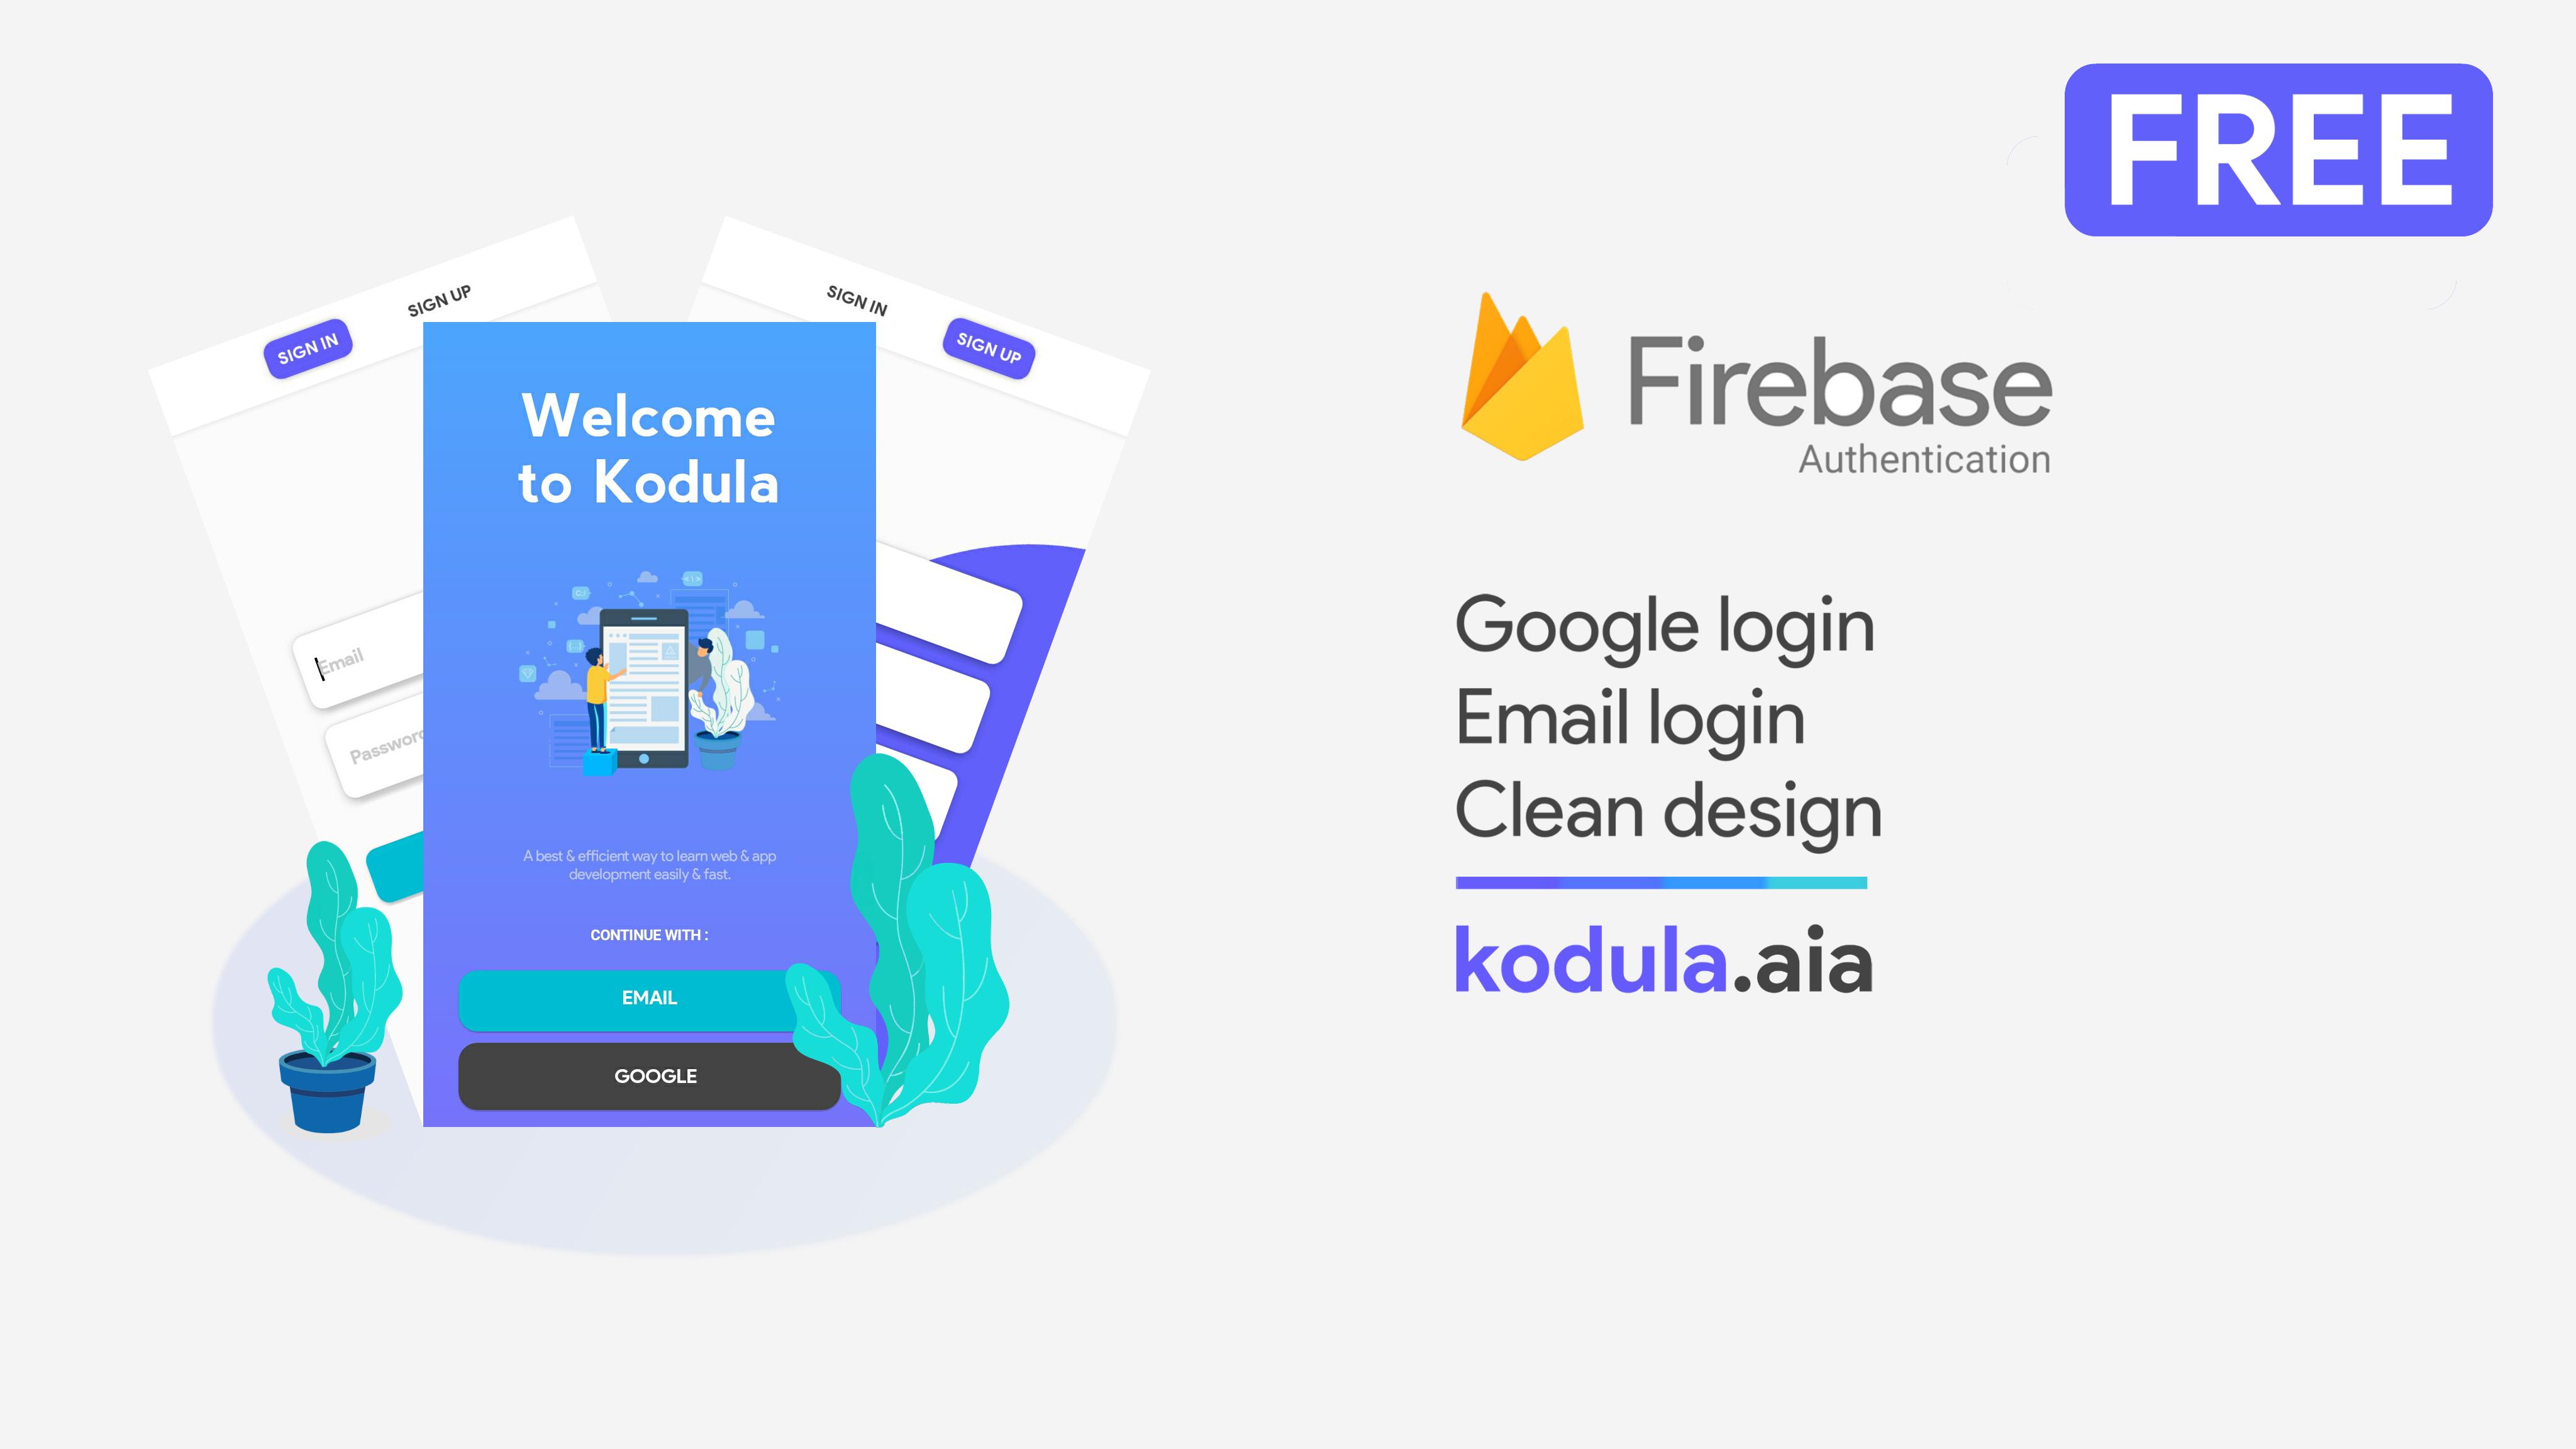 FREE] Kodula - firebase authentication app aia file - Open